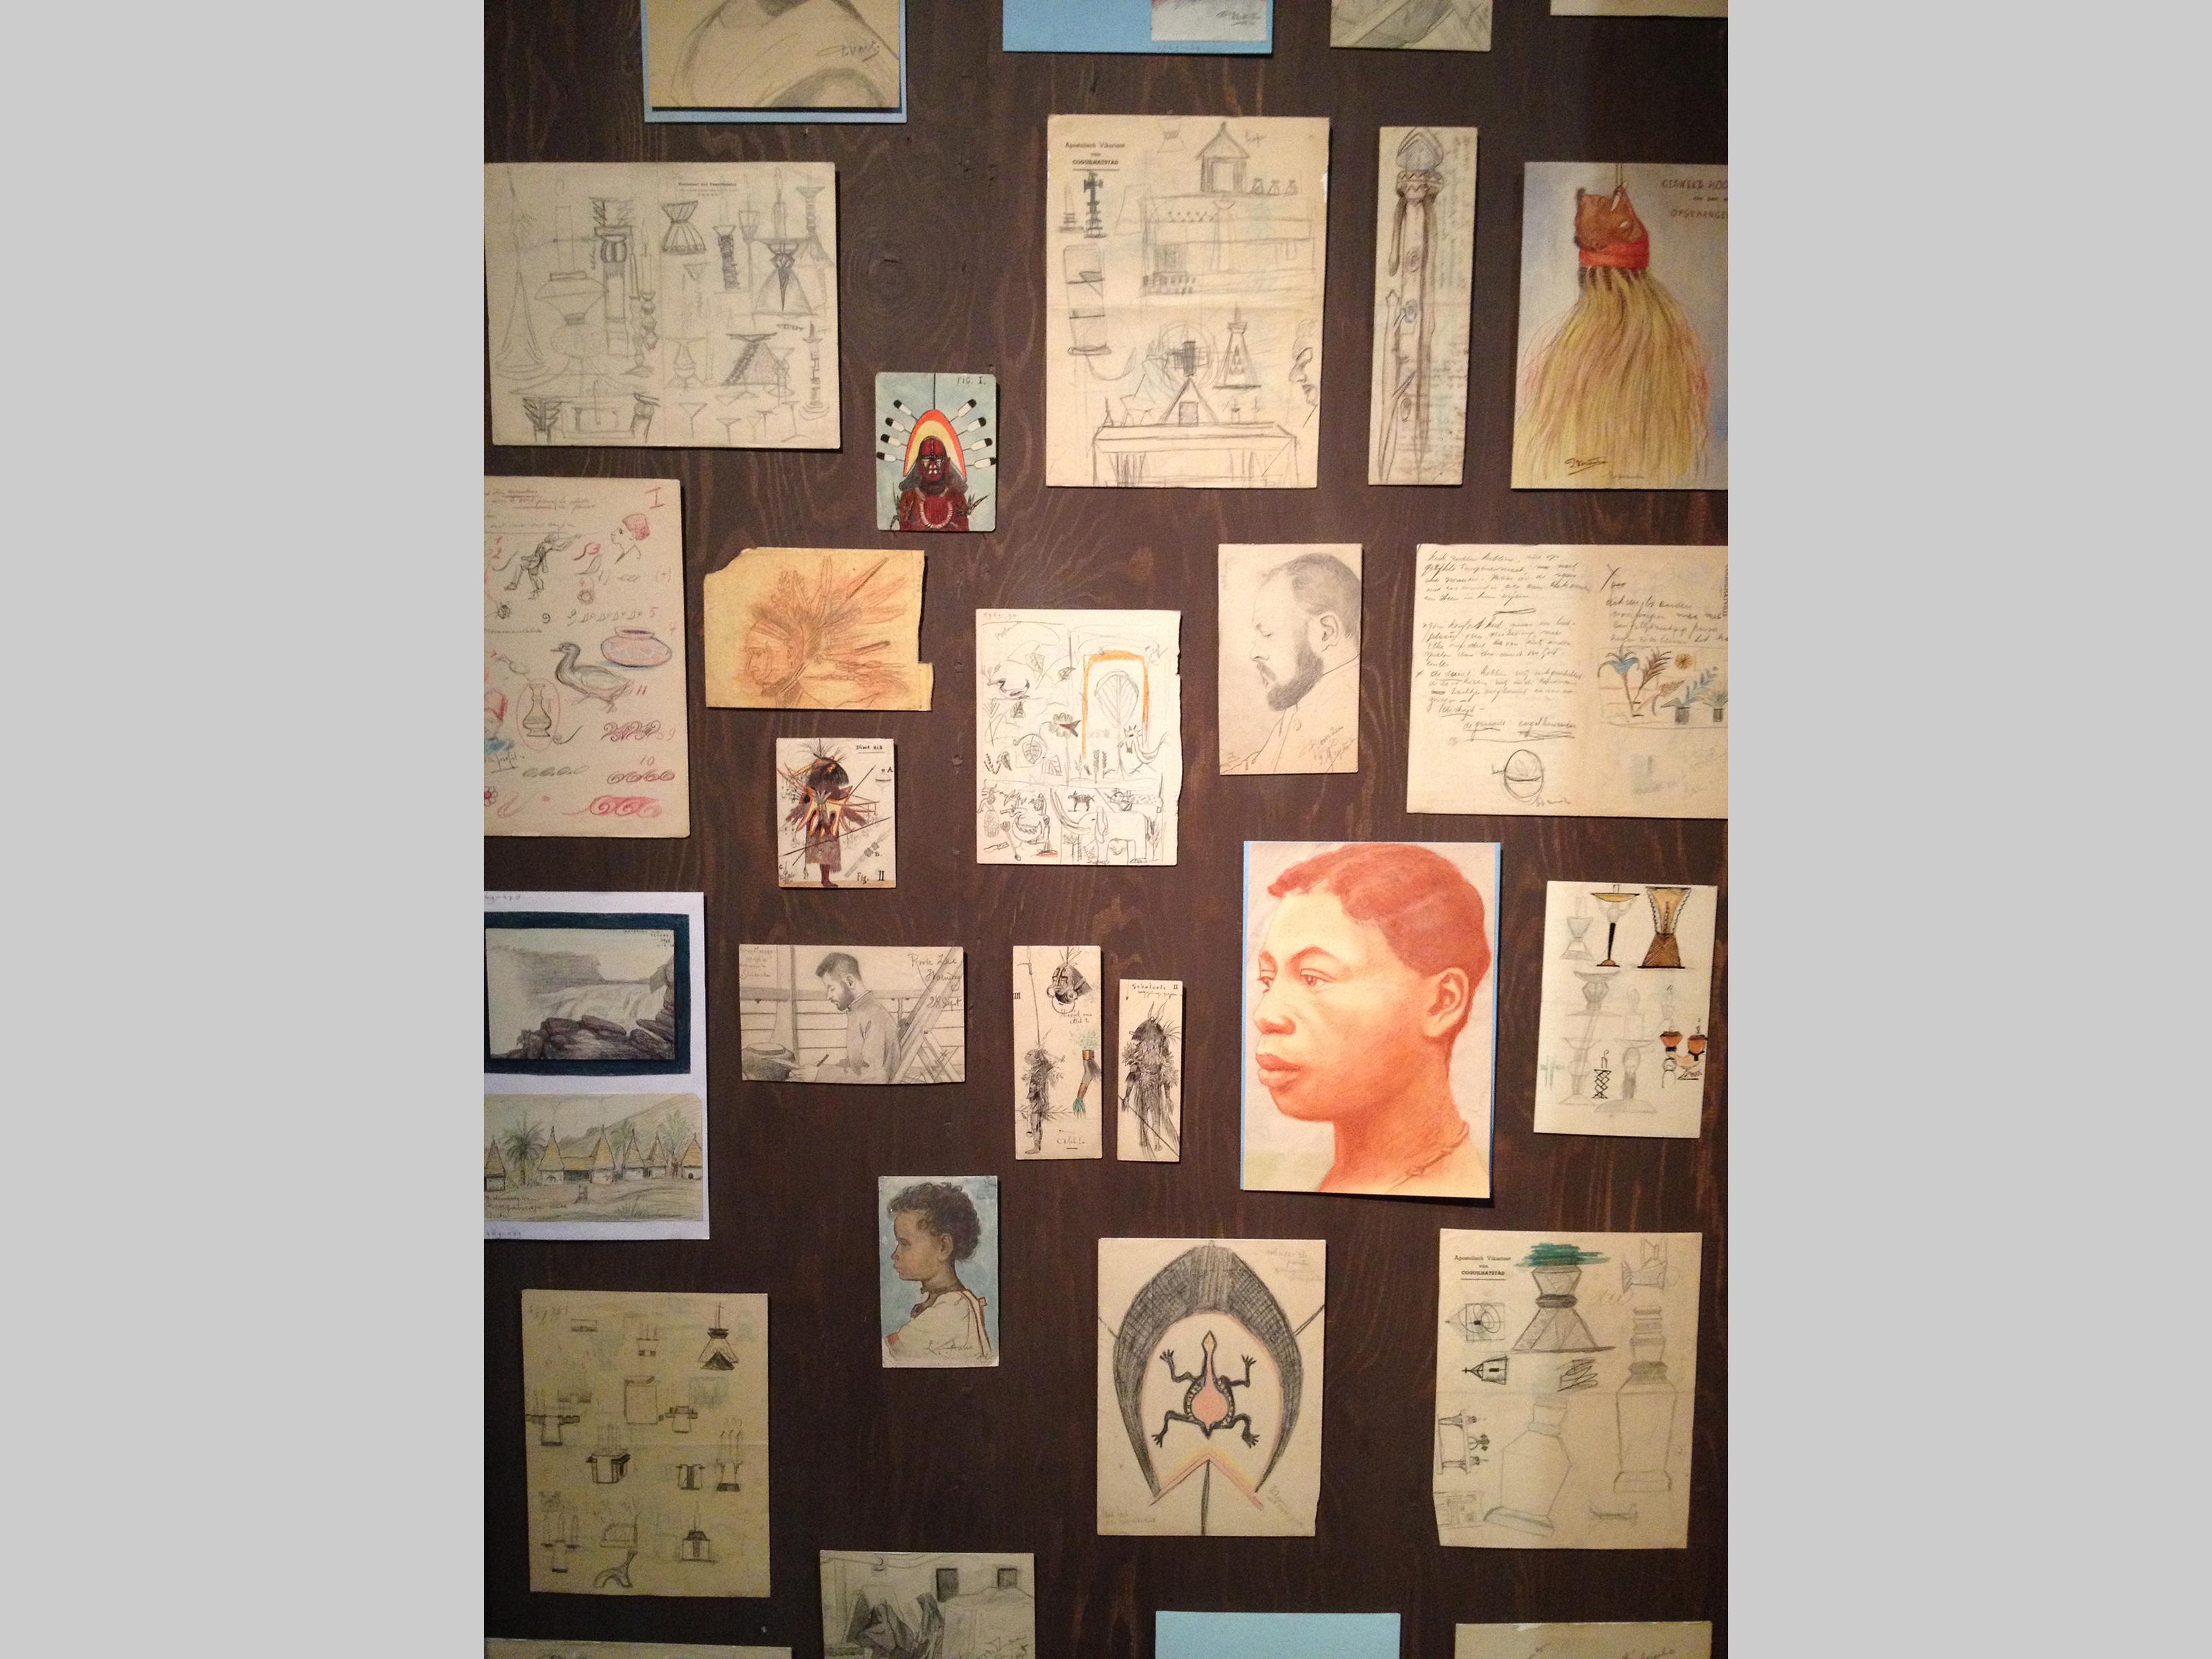 'Soulmade' Tropenmuseum 2014